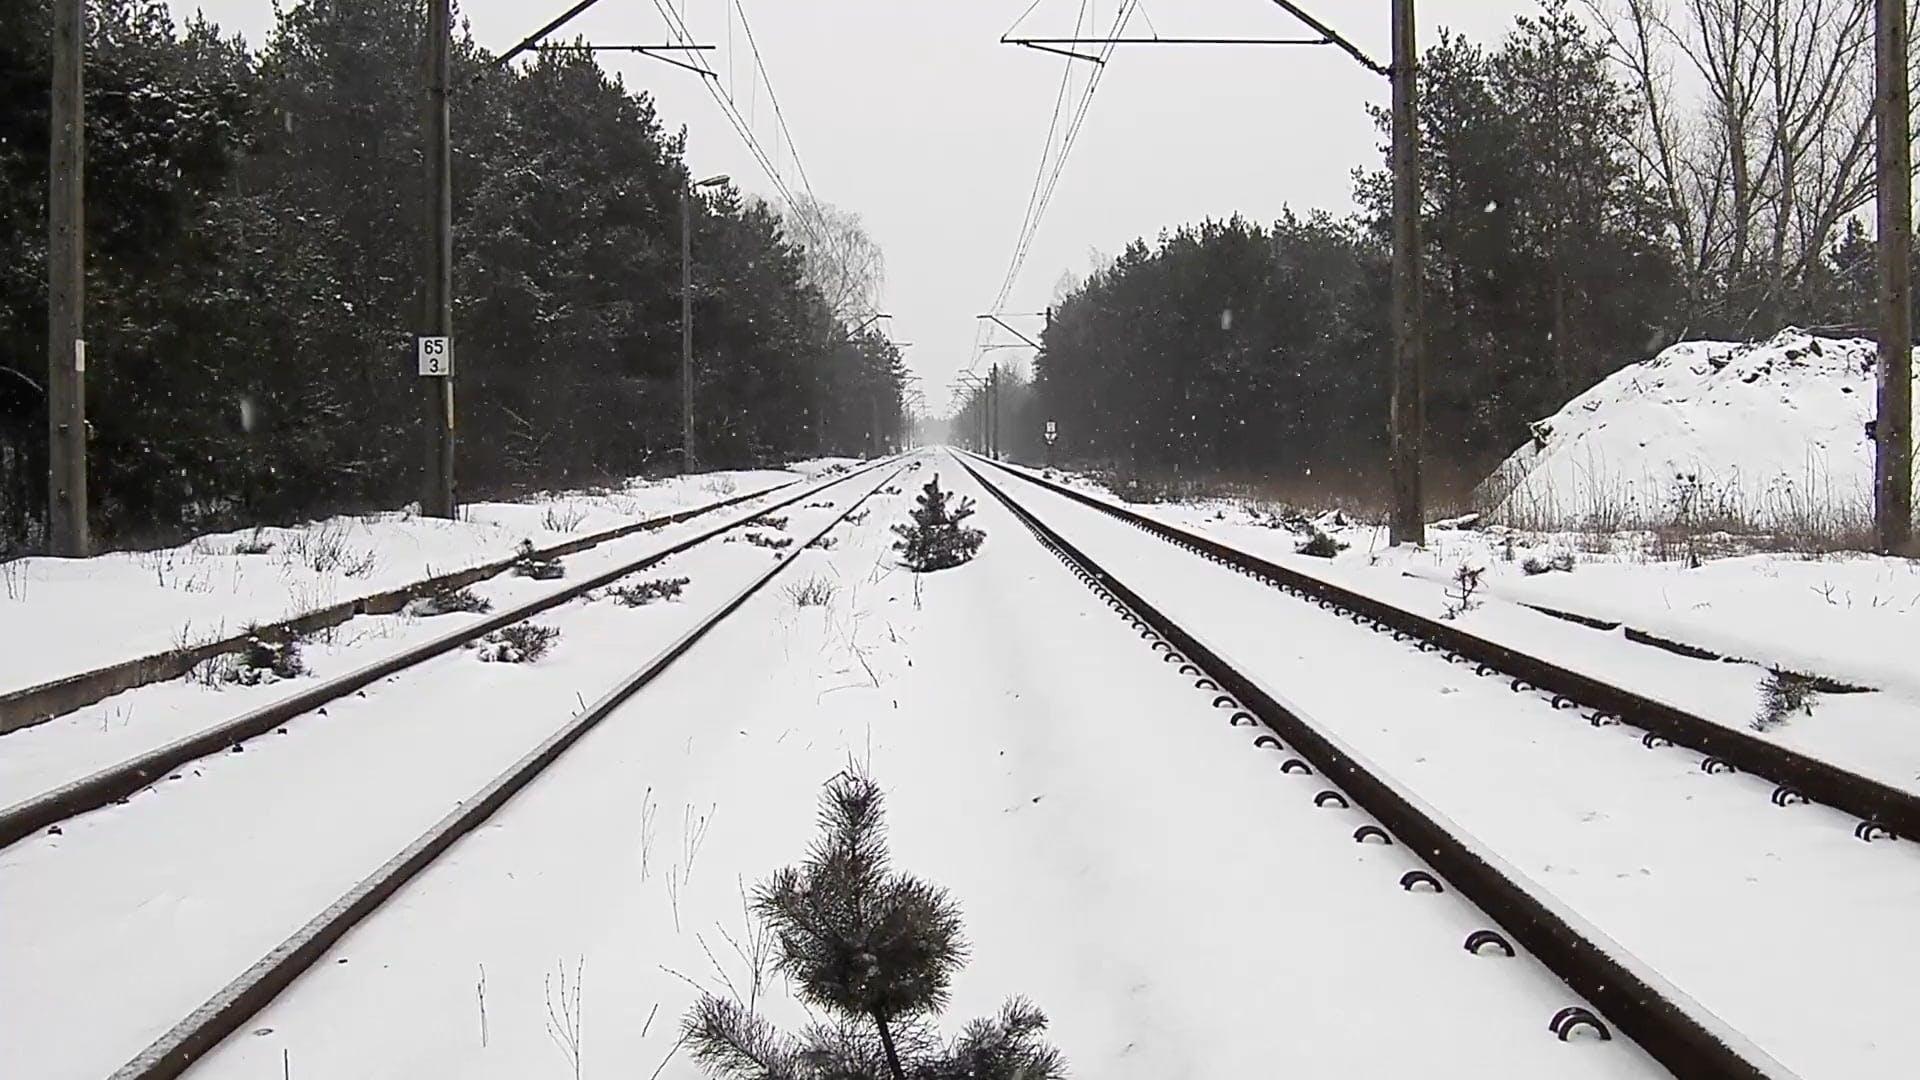 Snowy Railroad Video